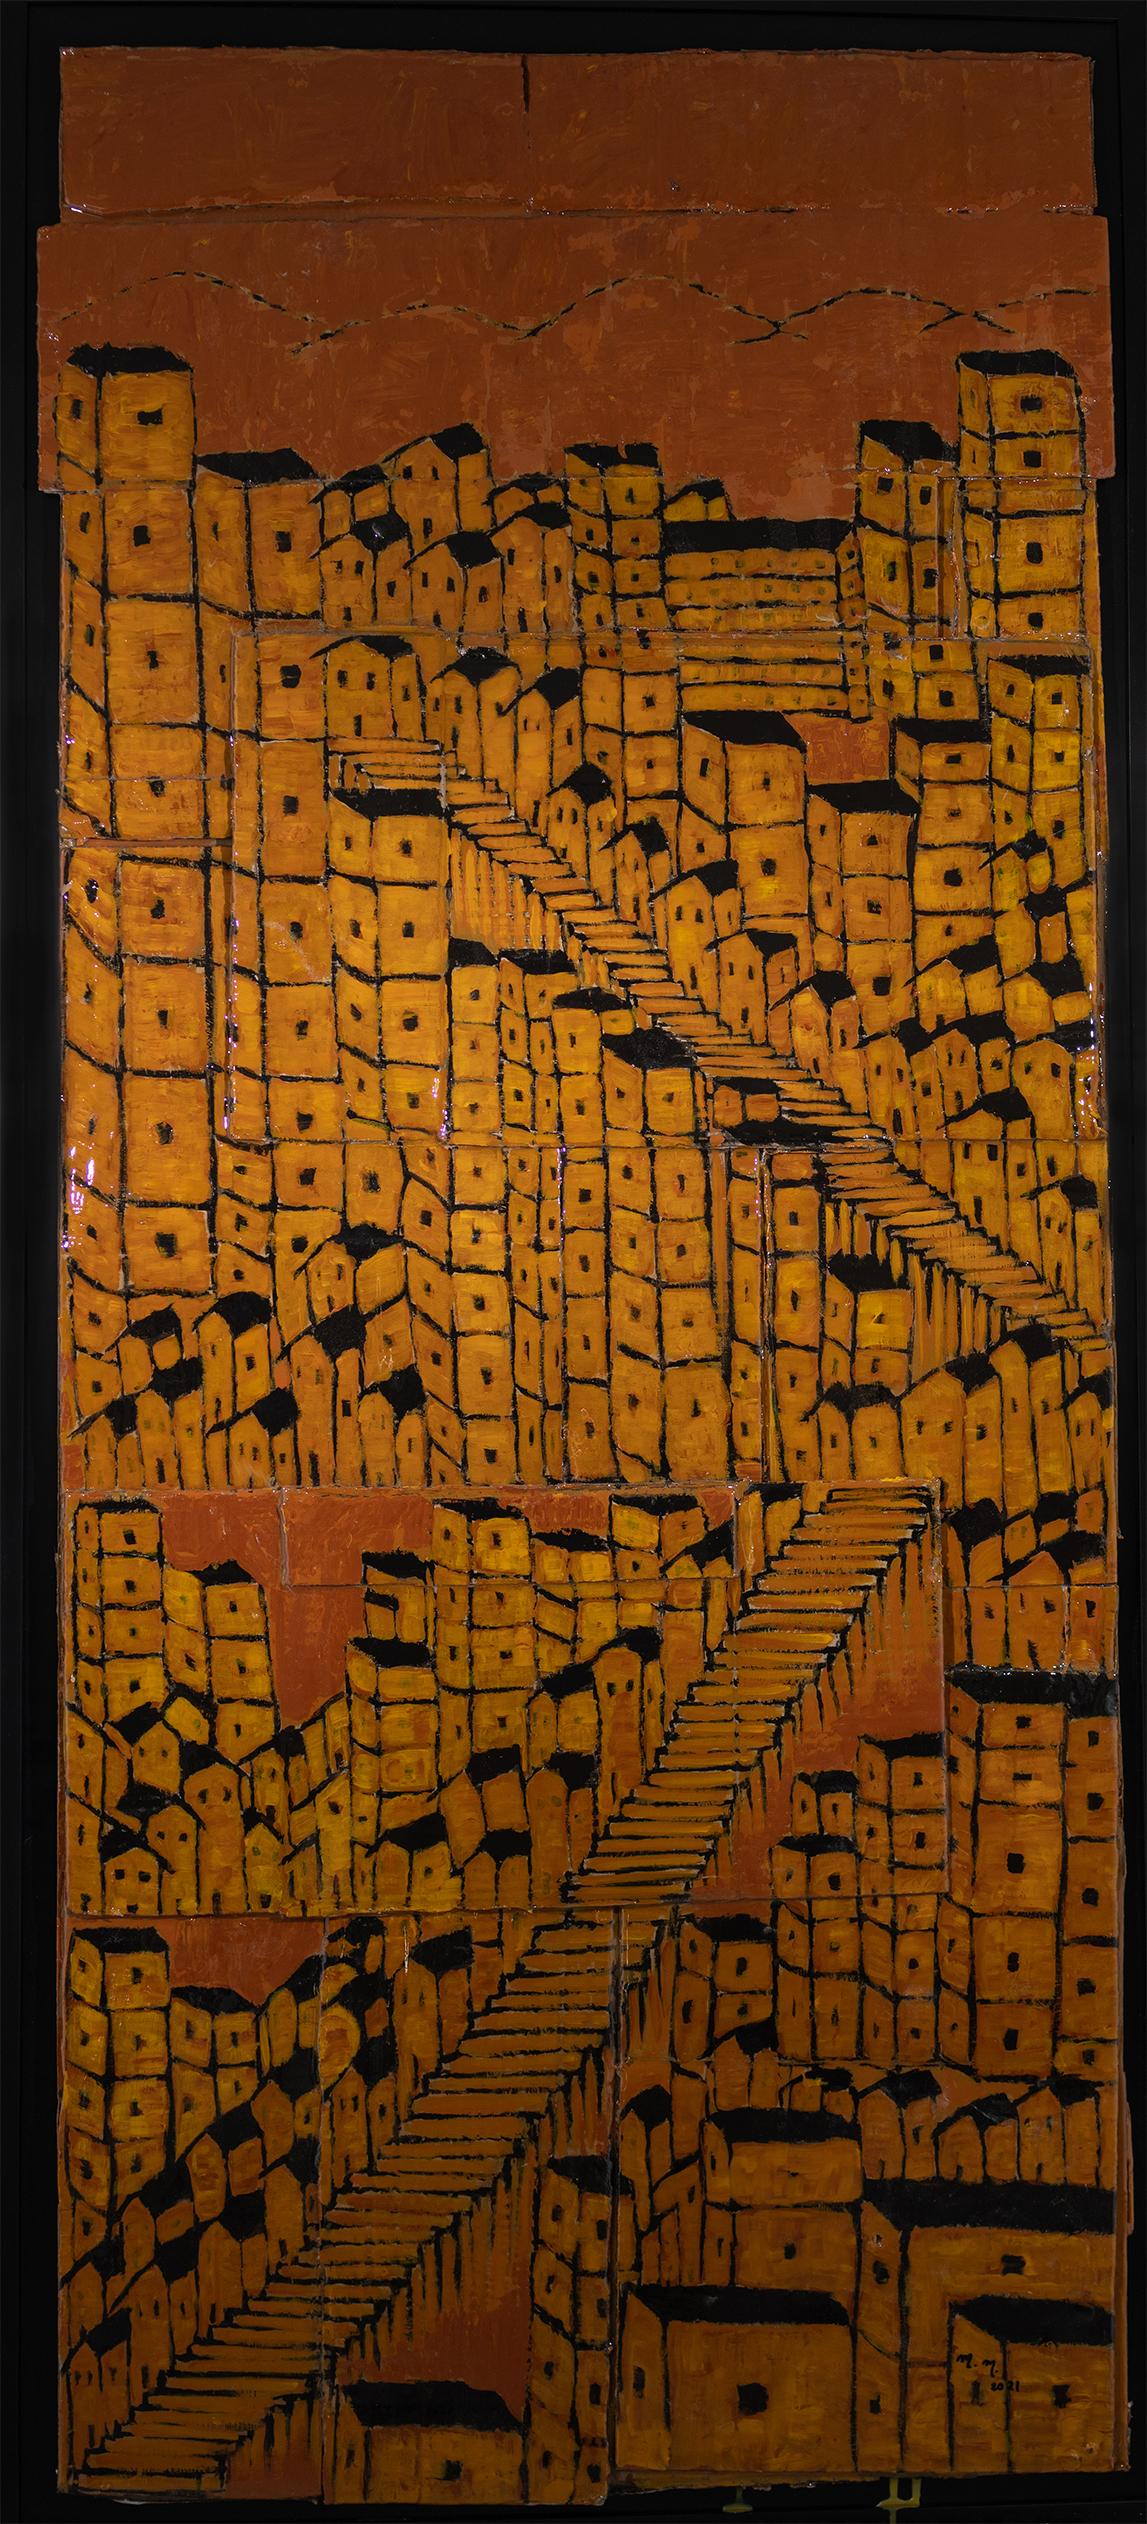 "Favela Cardboard - 60.5"" x 26"" - Mix Media on Cardboard"